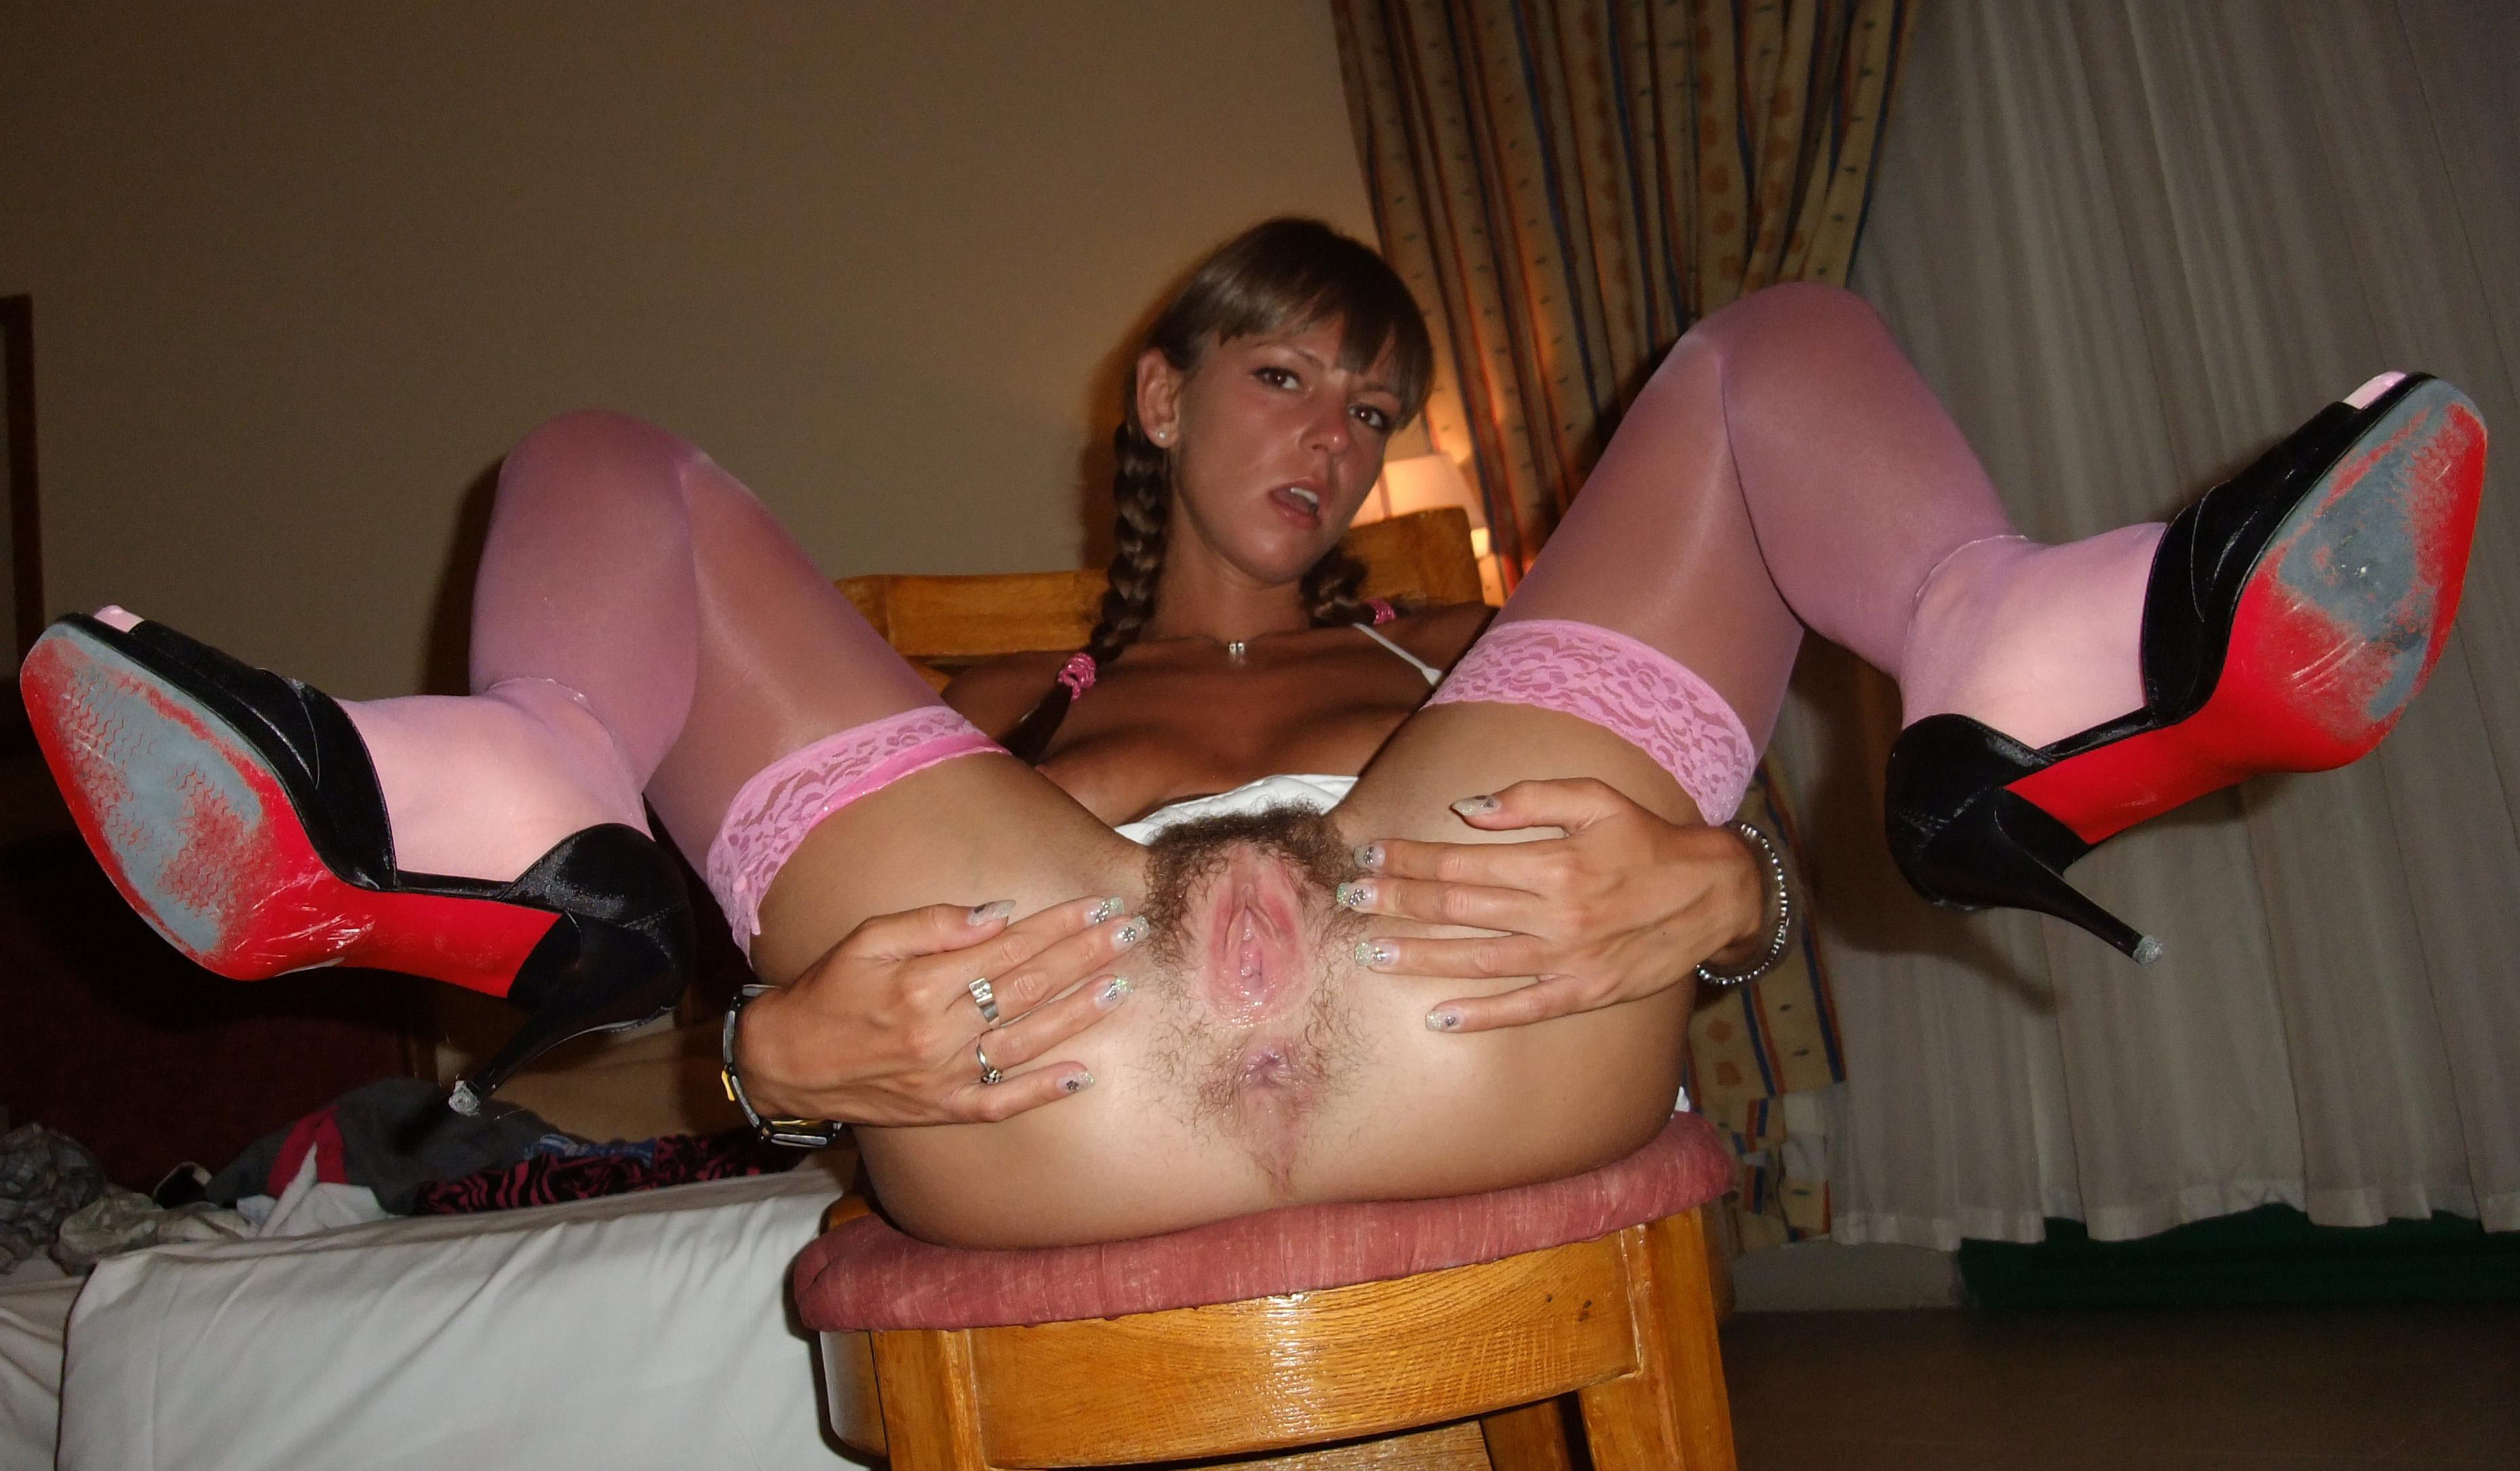 Men sucking passionately pussy